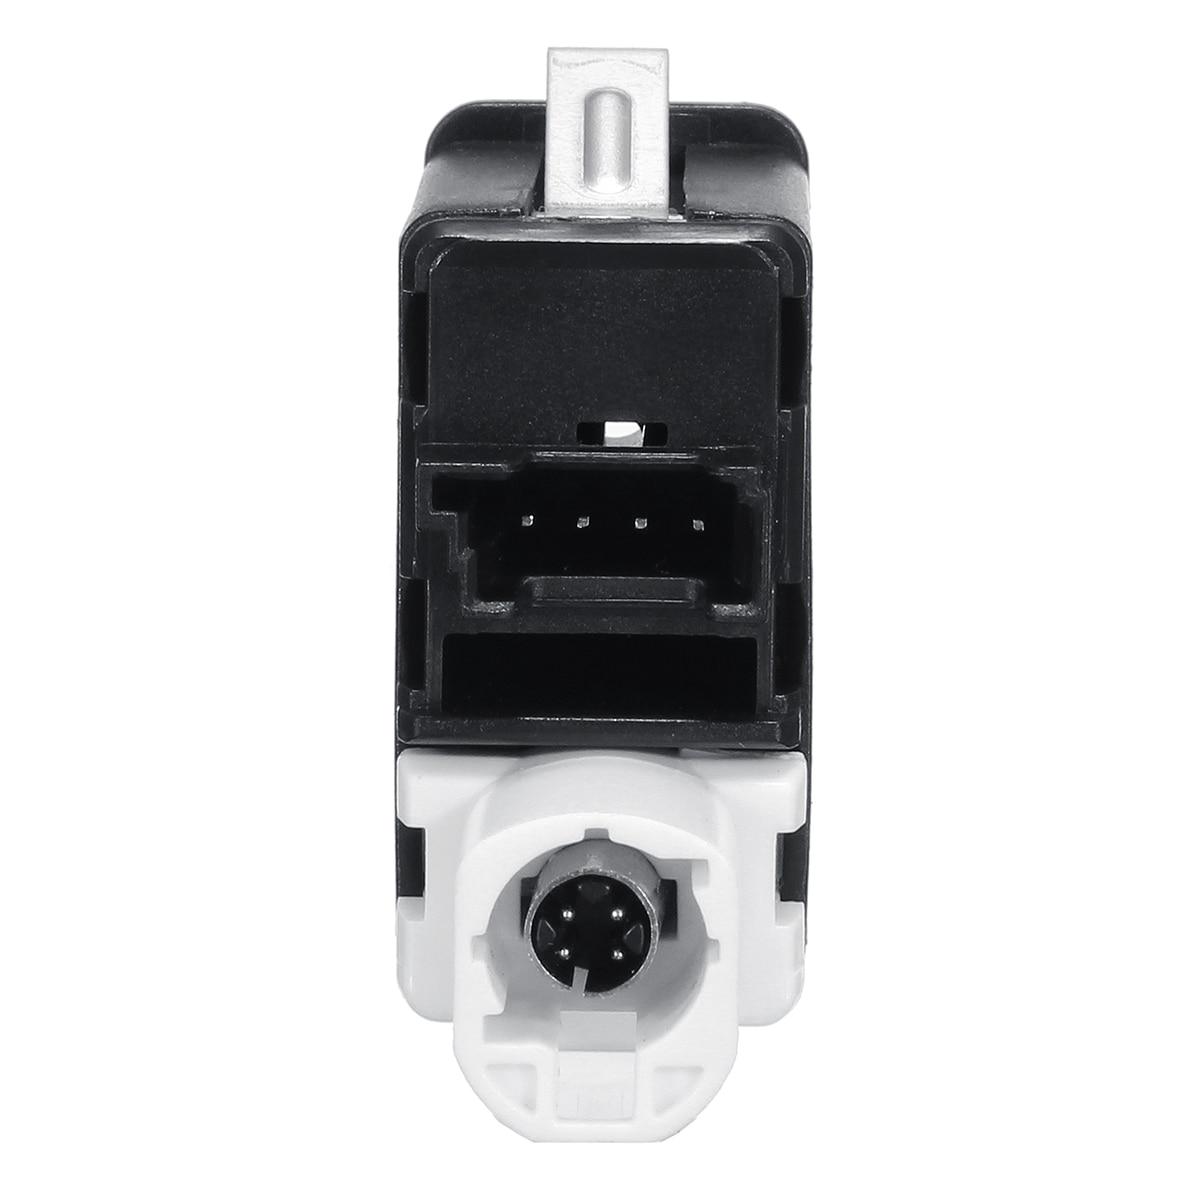 auxiliar adaptador para bmw e63 e81 e87 e90 f10 f12 e70 x1 x3 x5